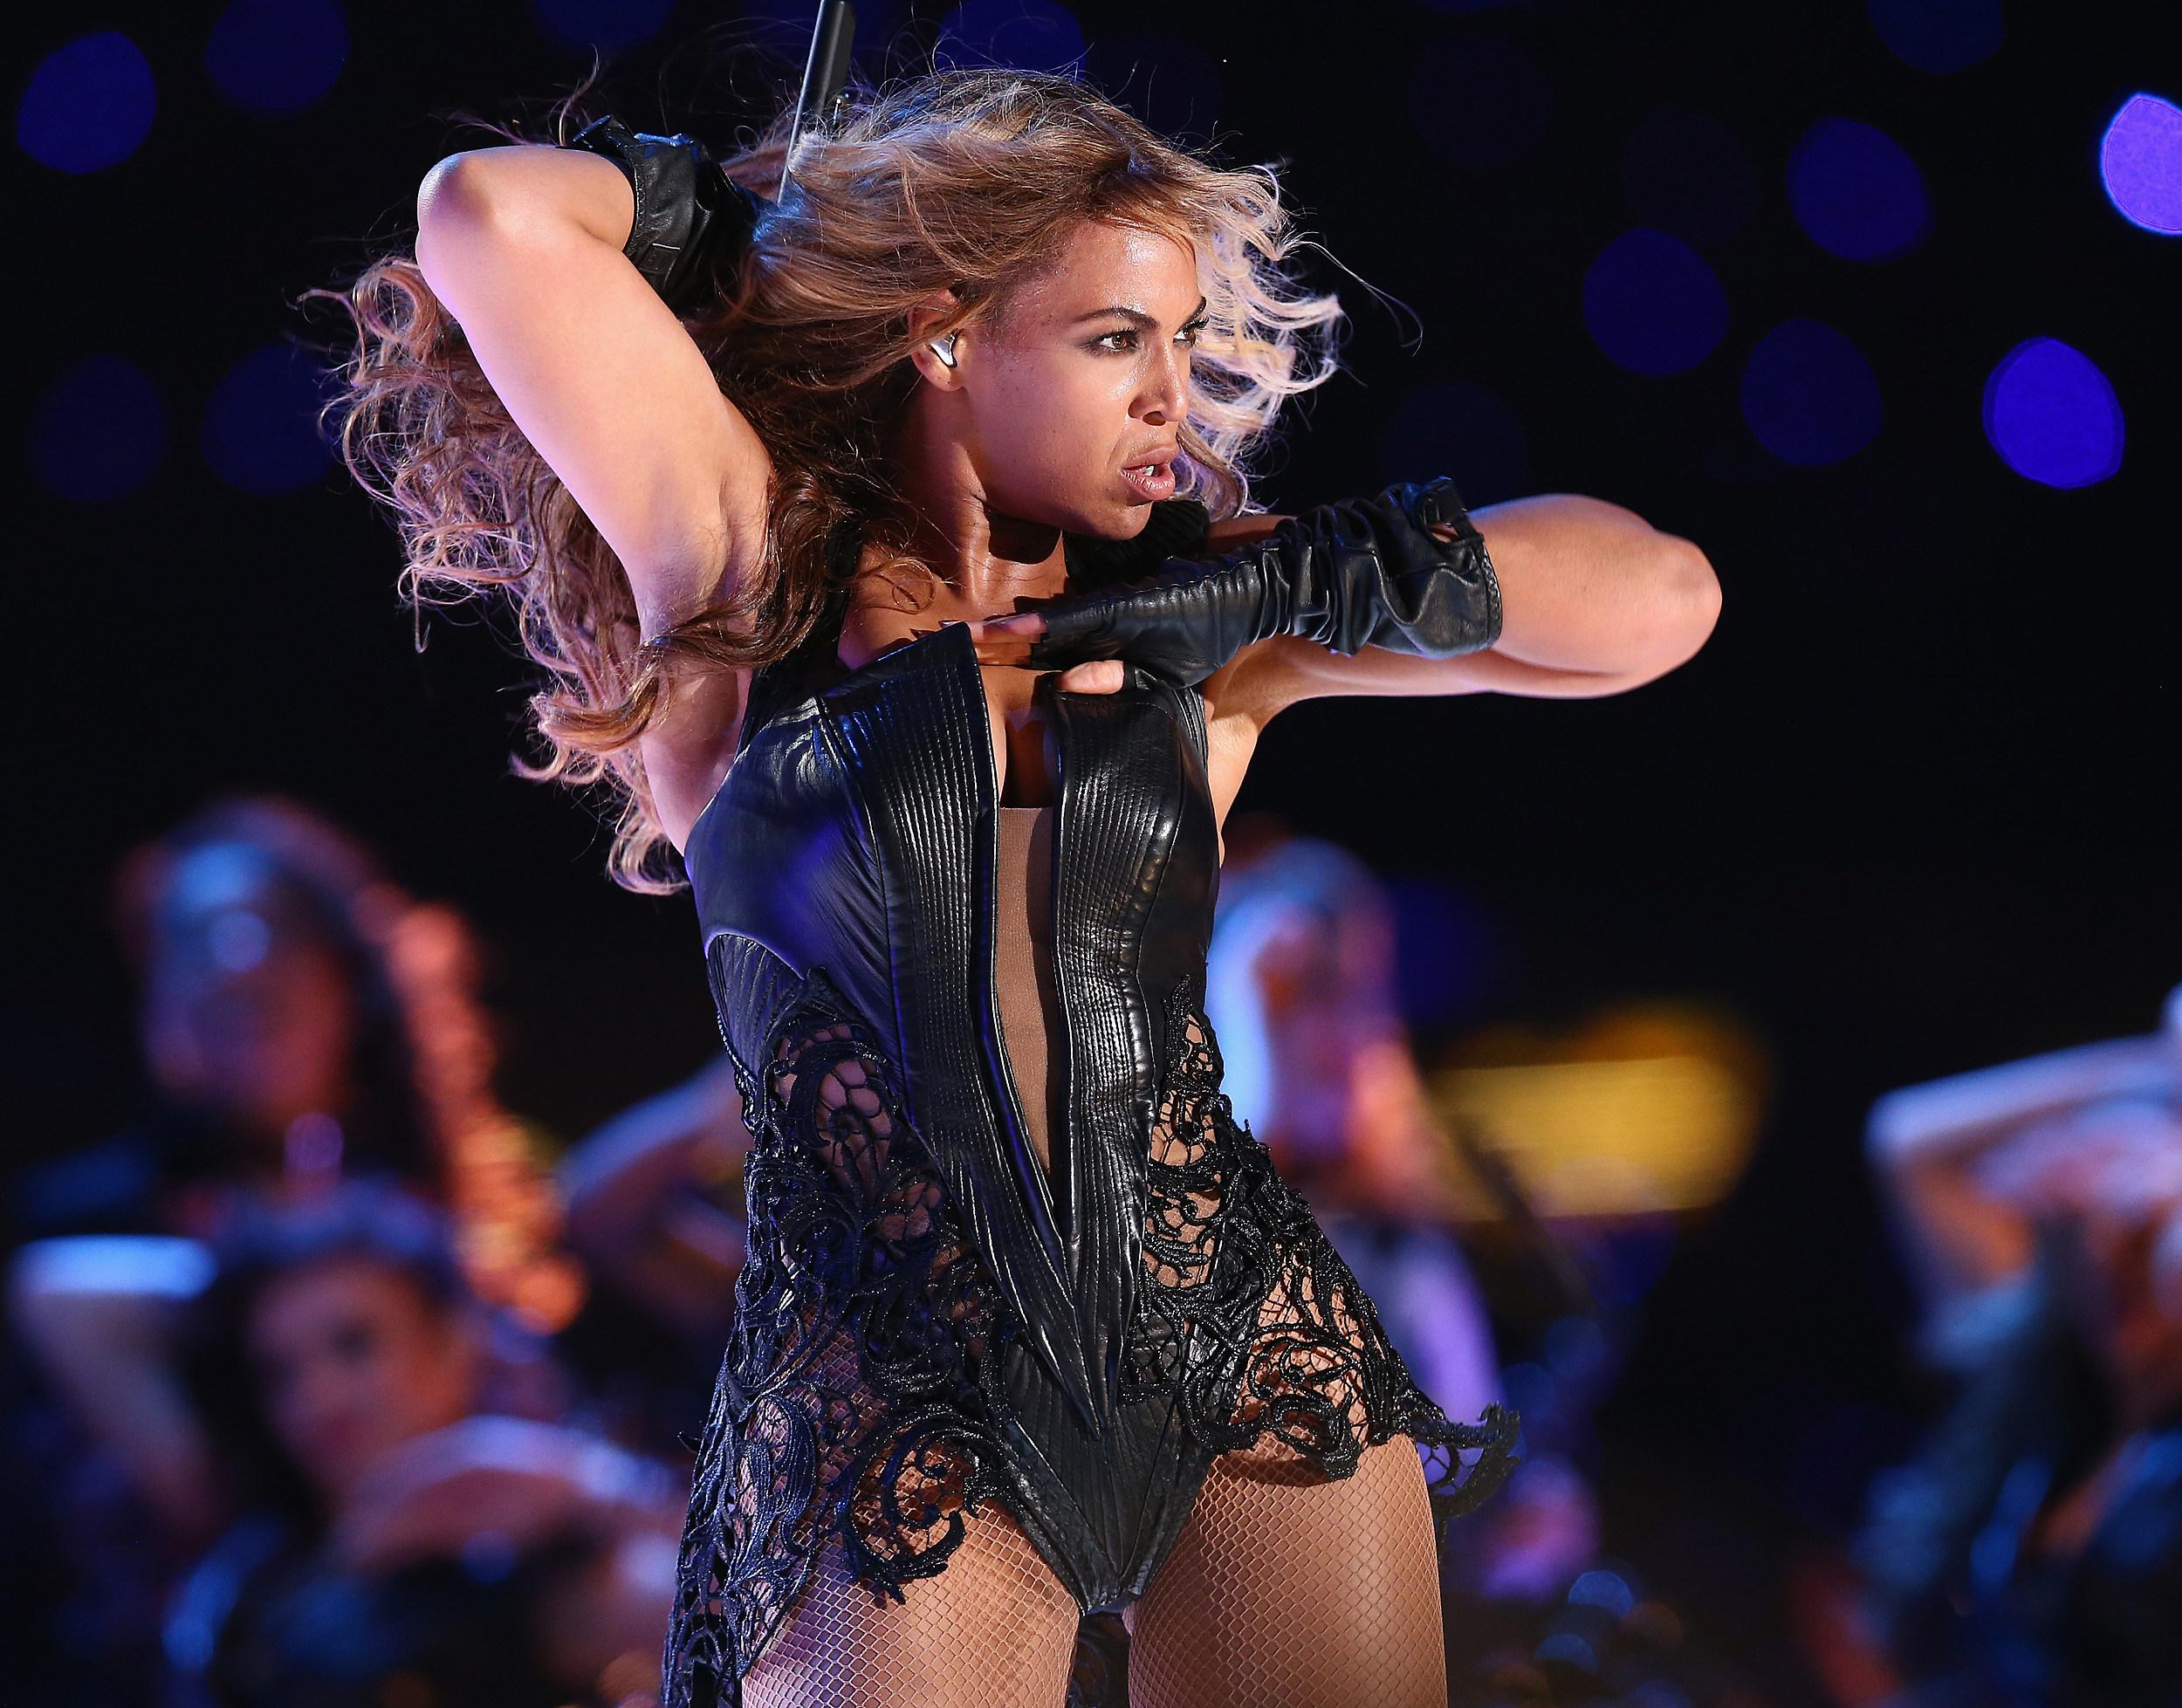 nipple slip wardrobe malfunction Beyonce